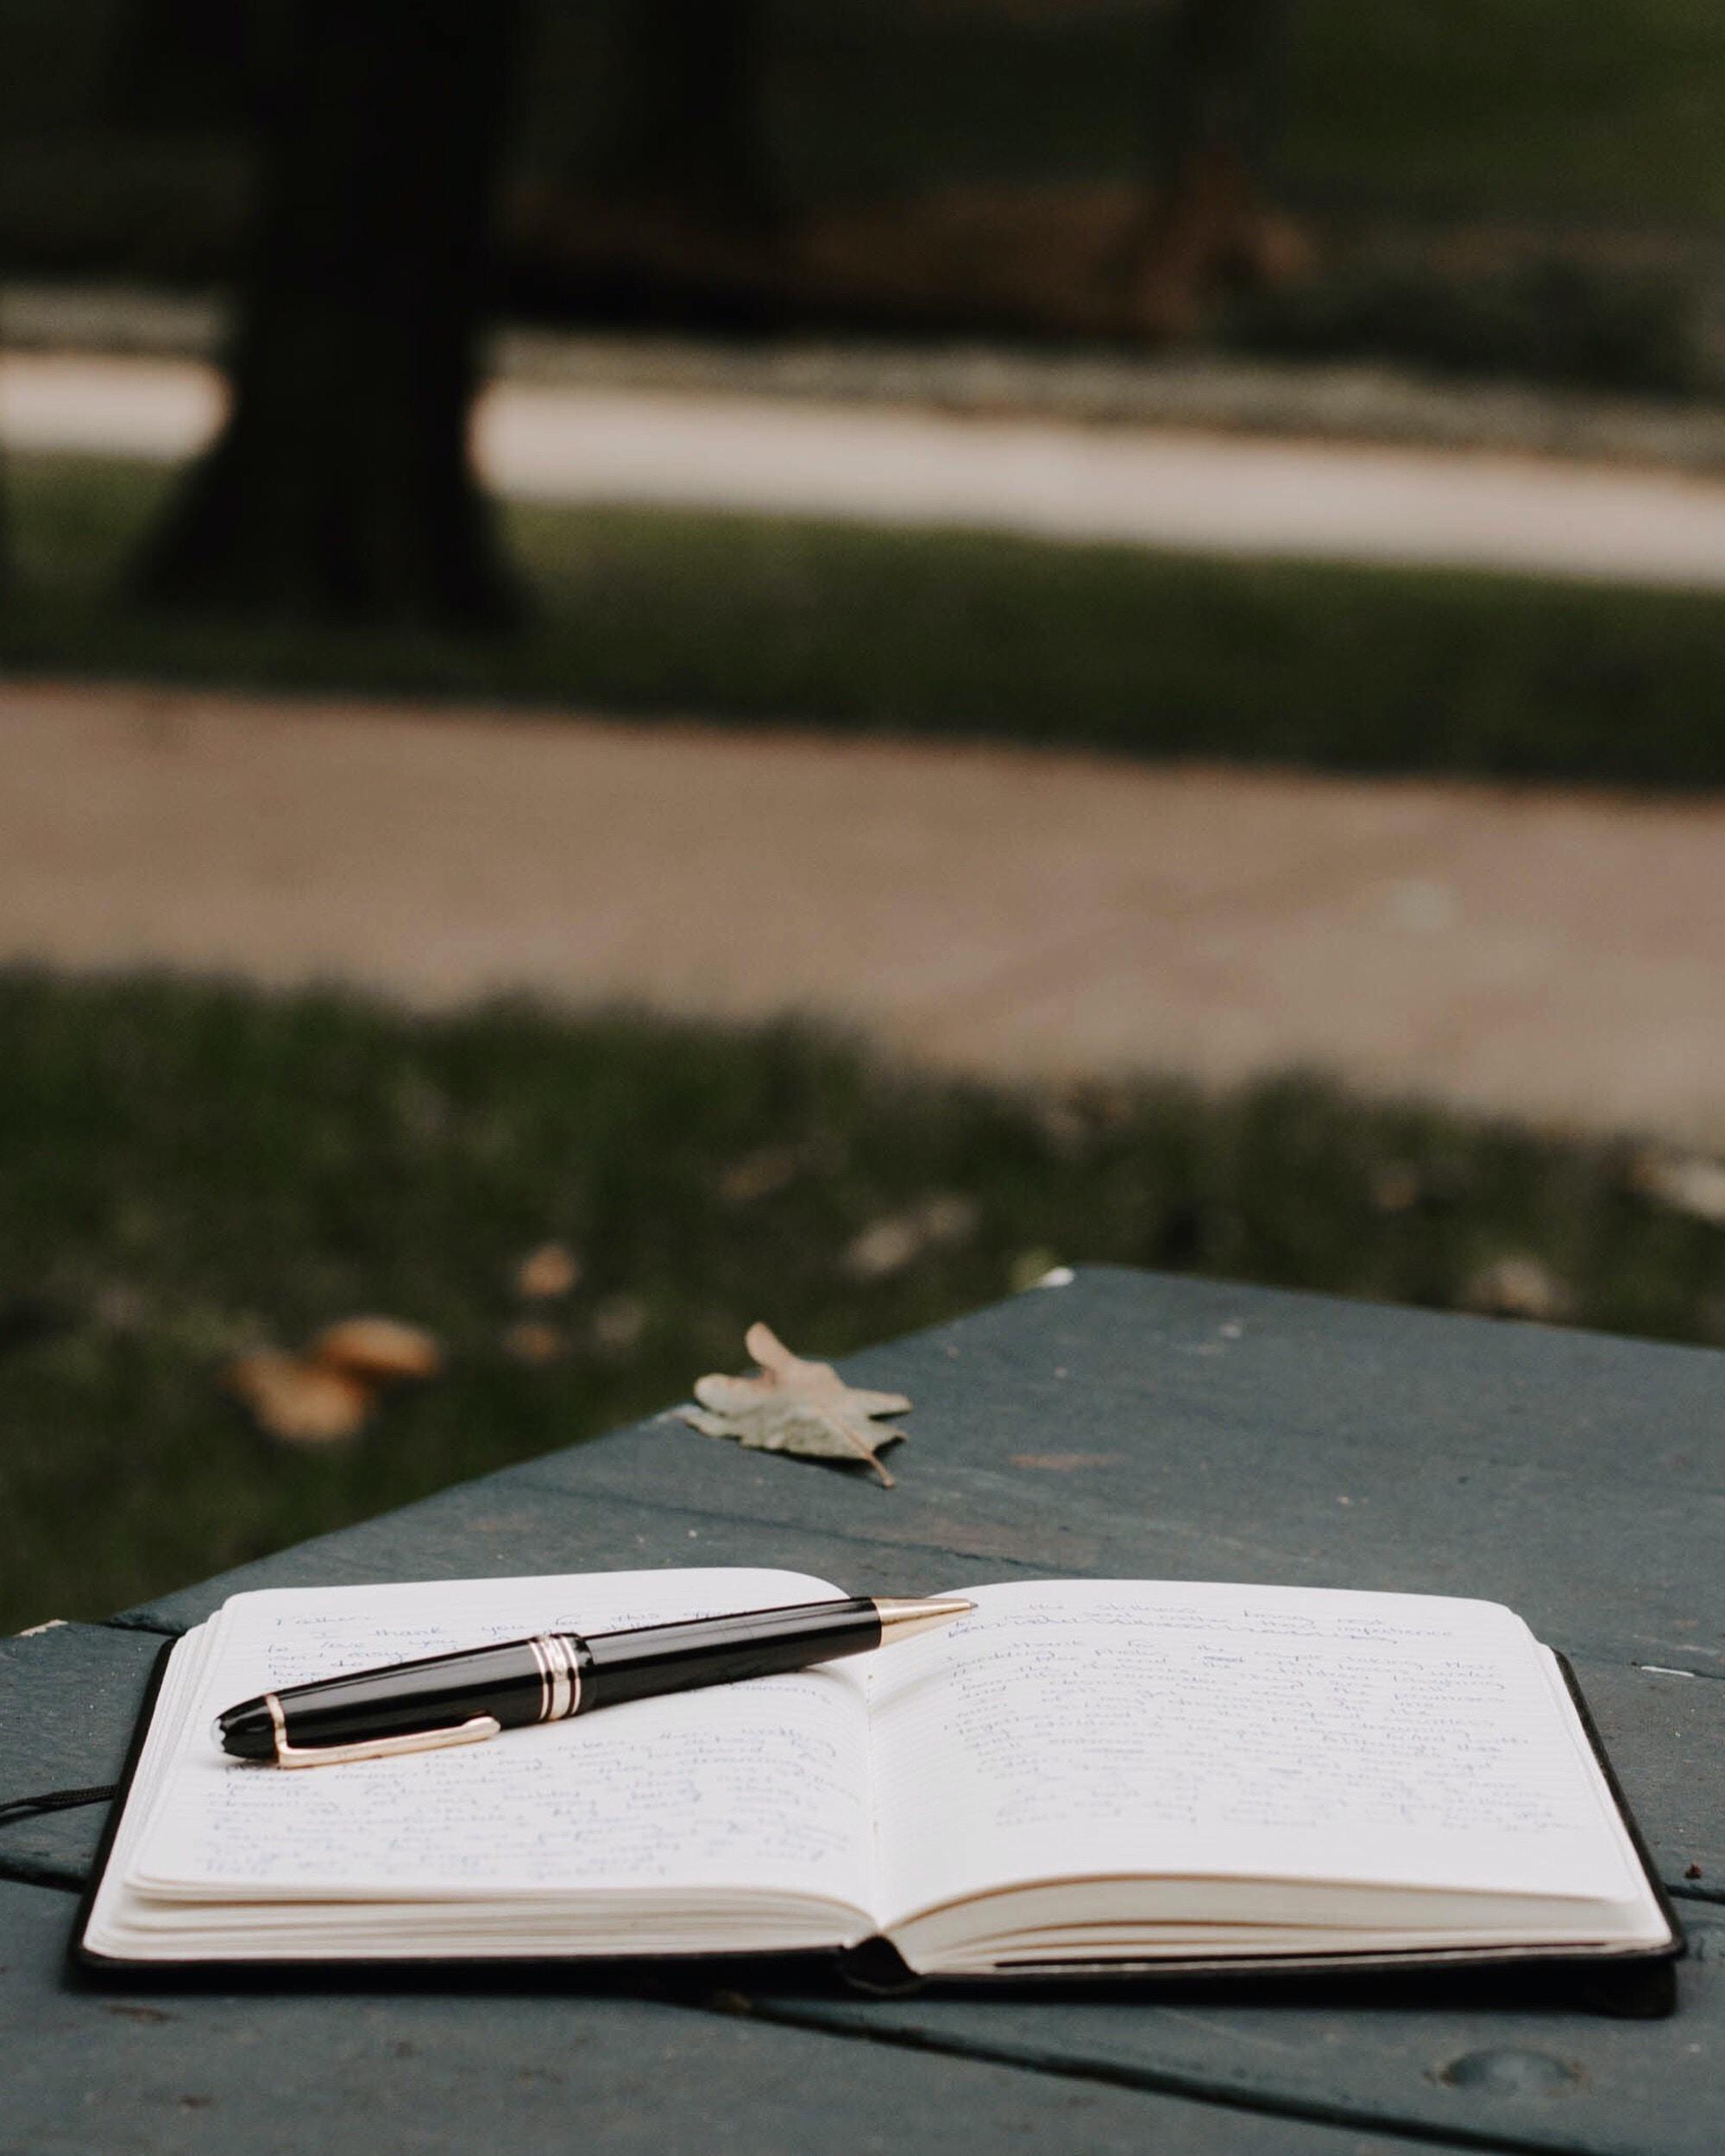 black twist pen and planner